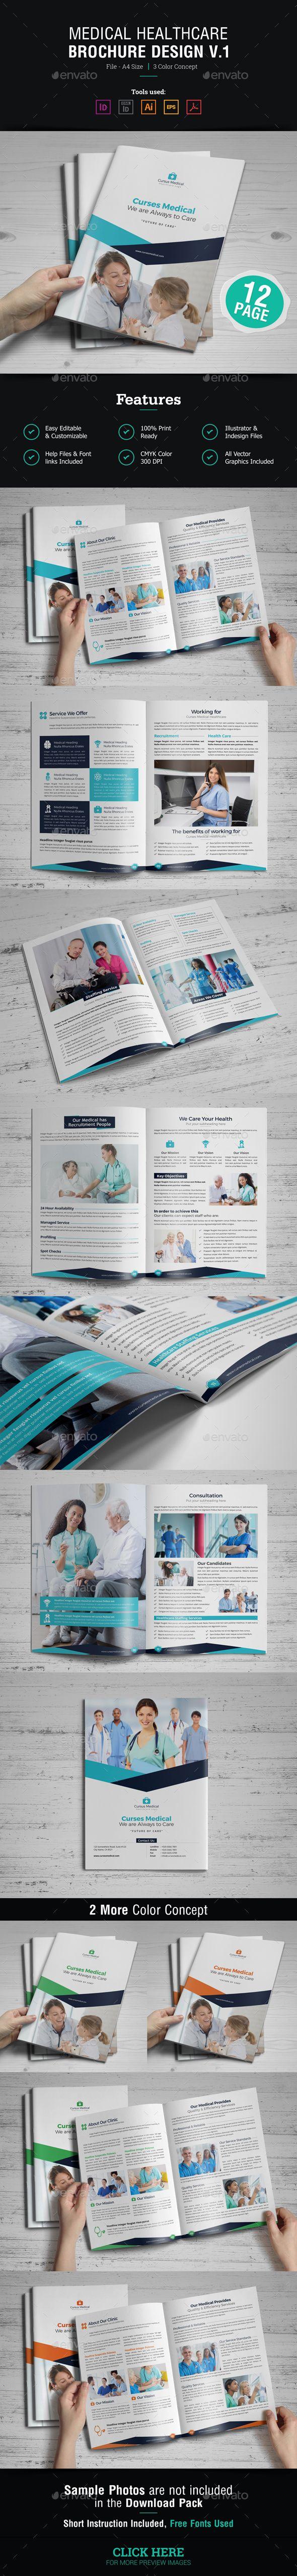 Medical HealthCare Brochure Template Vector EPS, InDesign INDD, AI Illustrator